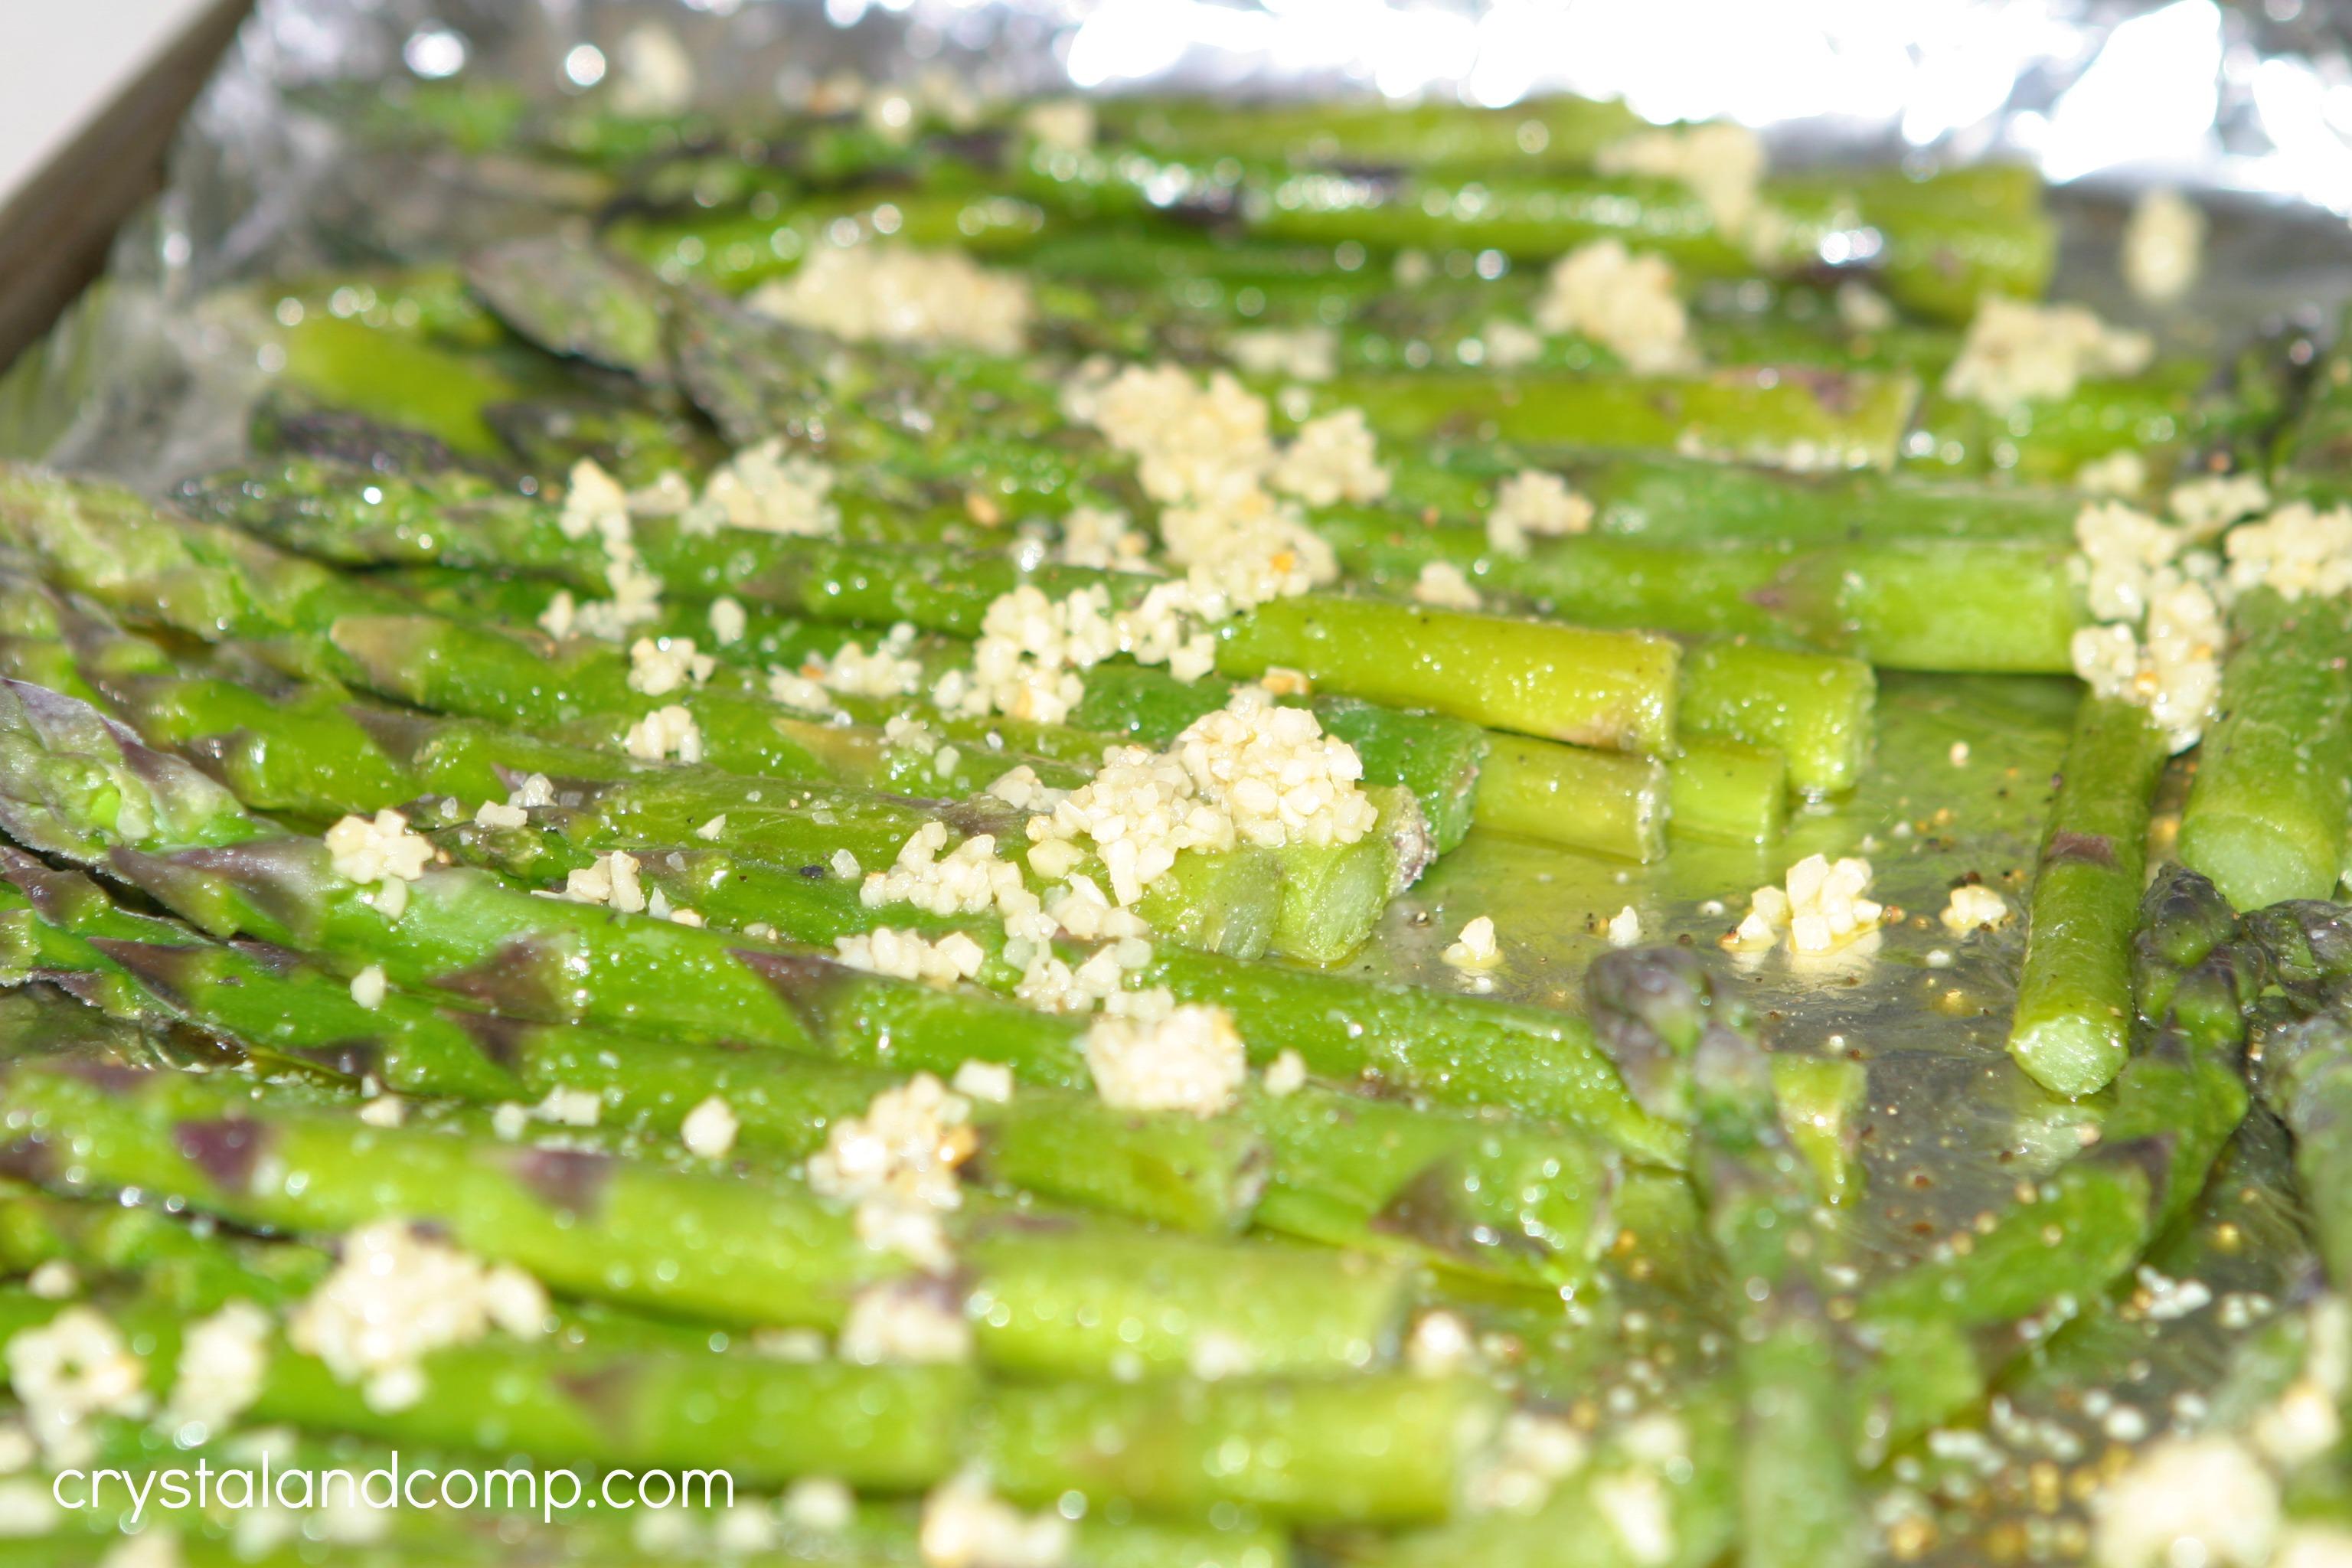 How To Bake Asparagus Real Easy Recipes: Baked Asparagus